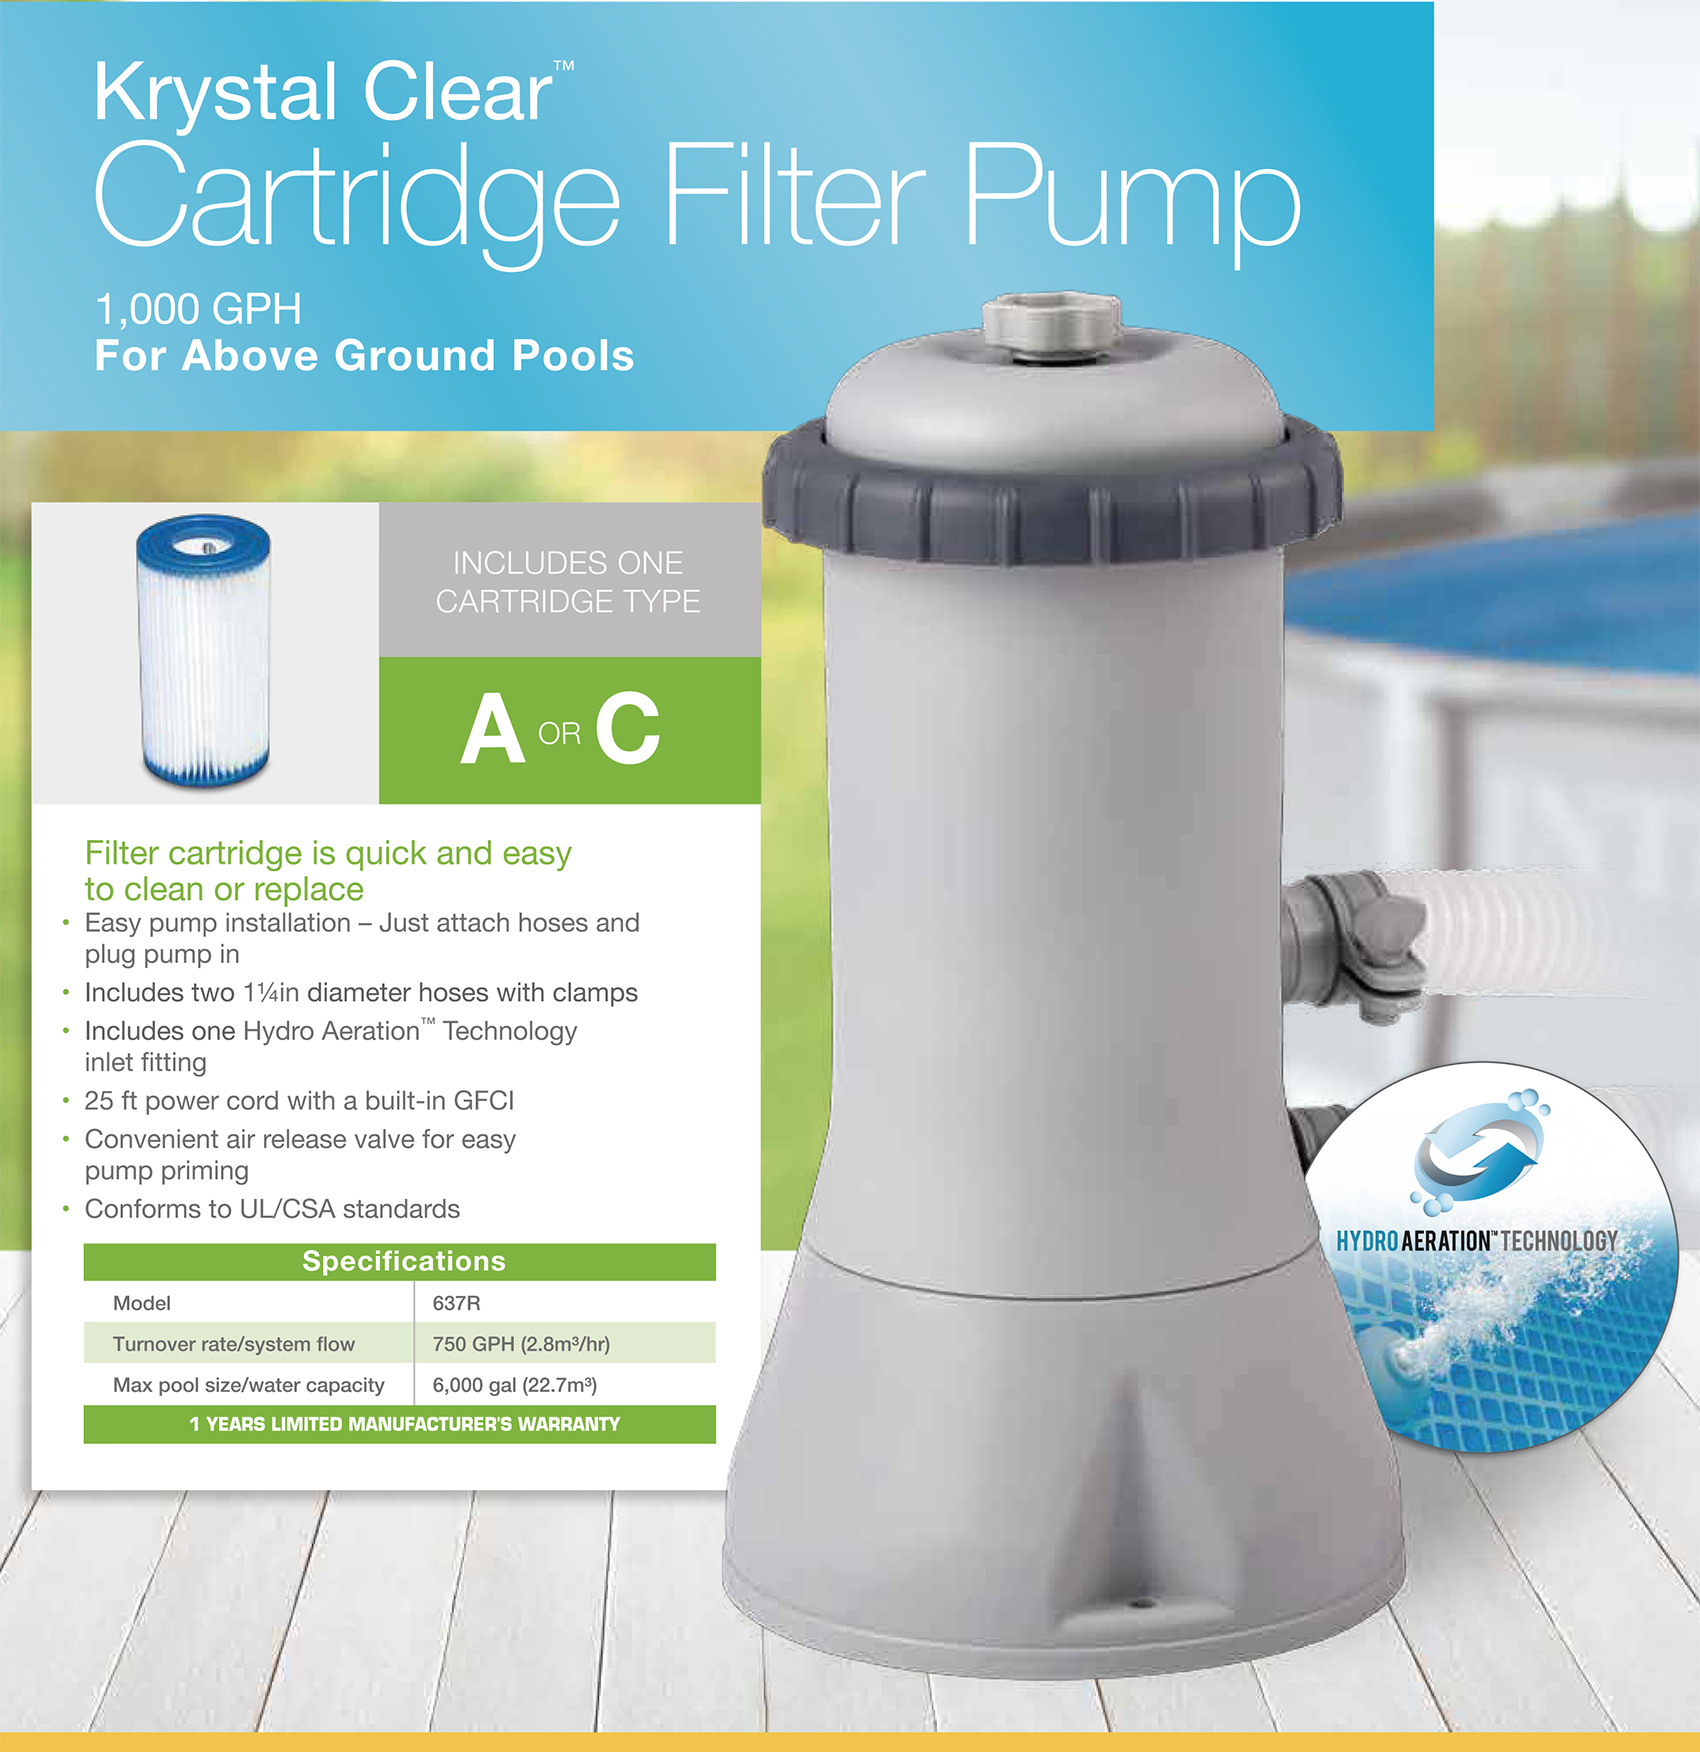 1000 Gph Krystal Clear Cartridge Filter Pump, 110-120V with GFCI